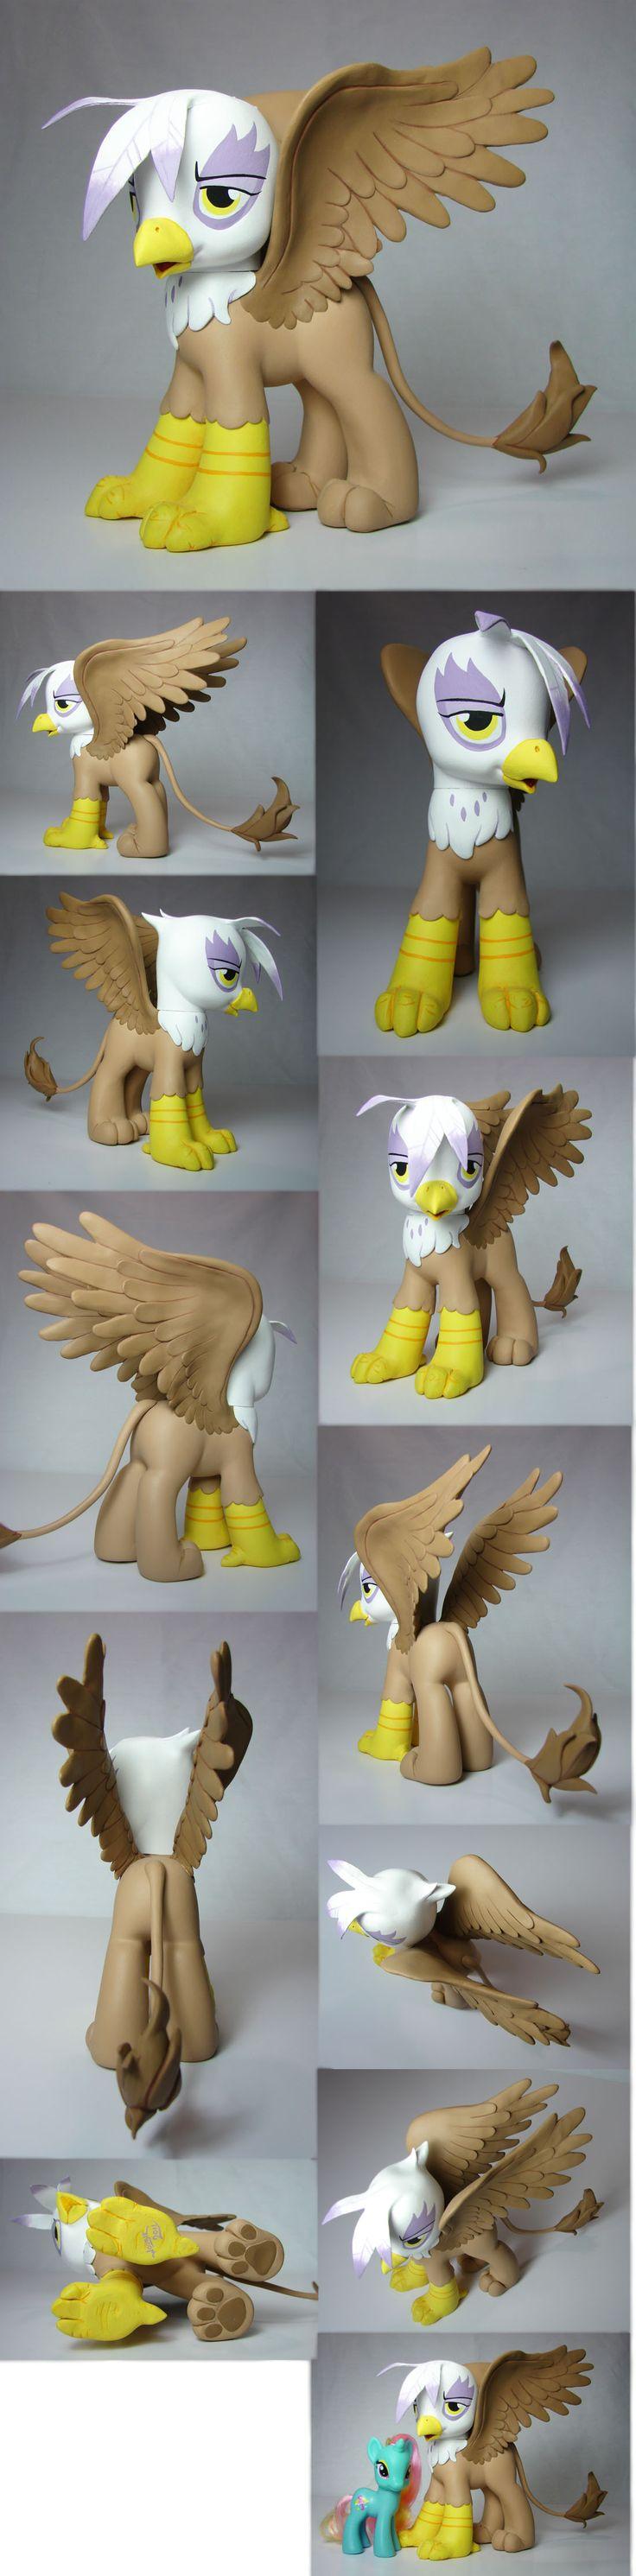 Gilda the Griffon my little pony FIM custom by Woosie.deviantart.com on @deviantART